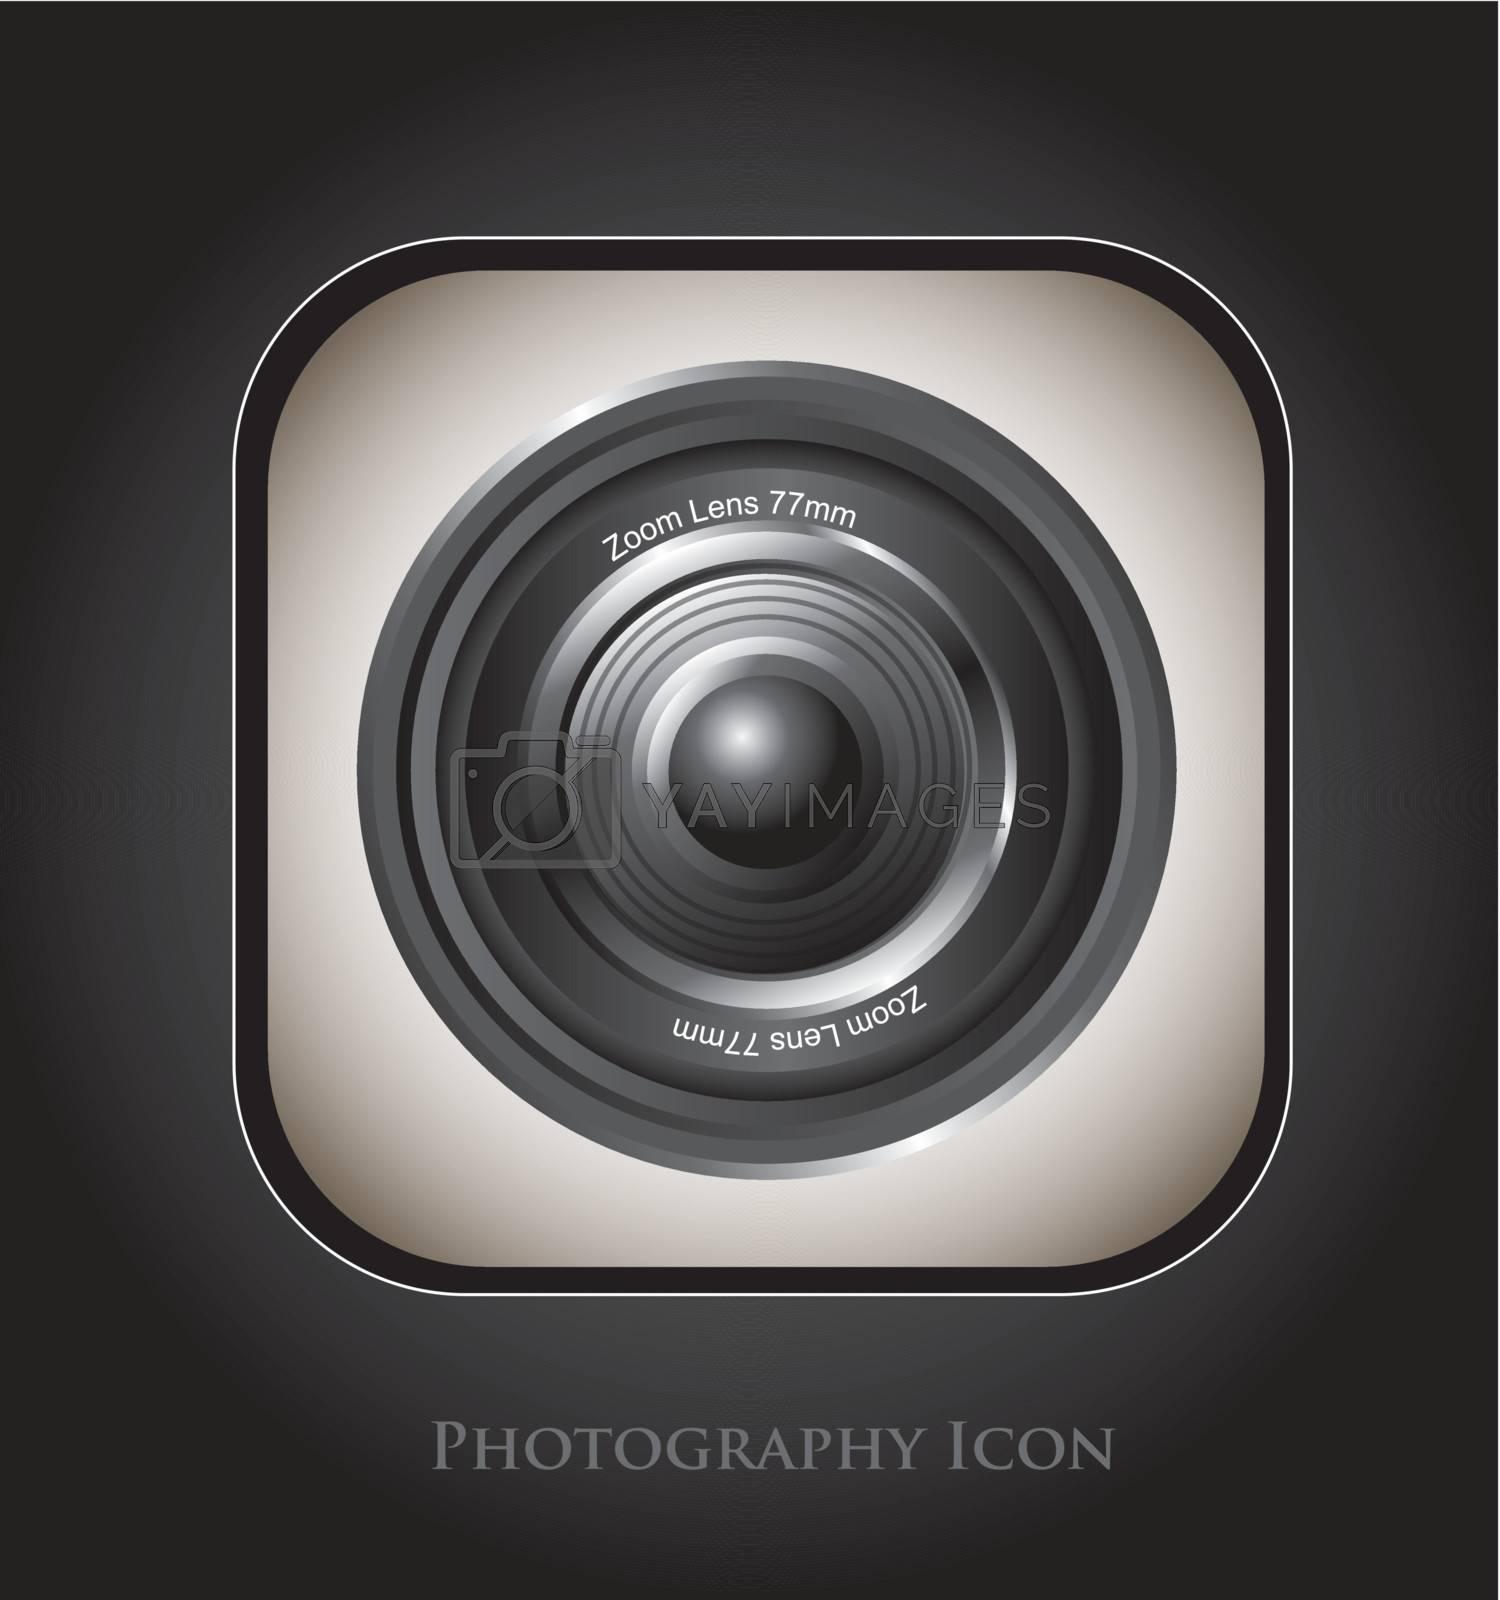 Photography icon  by yupiramos